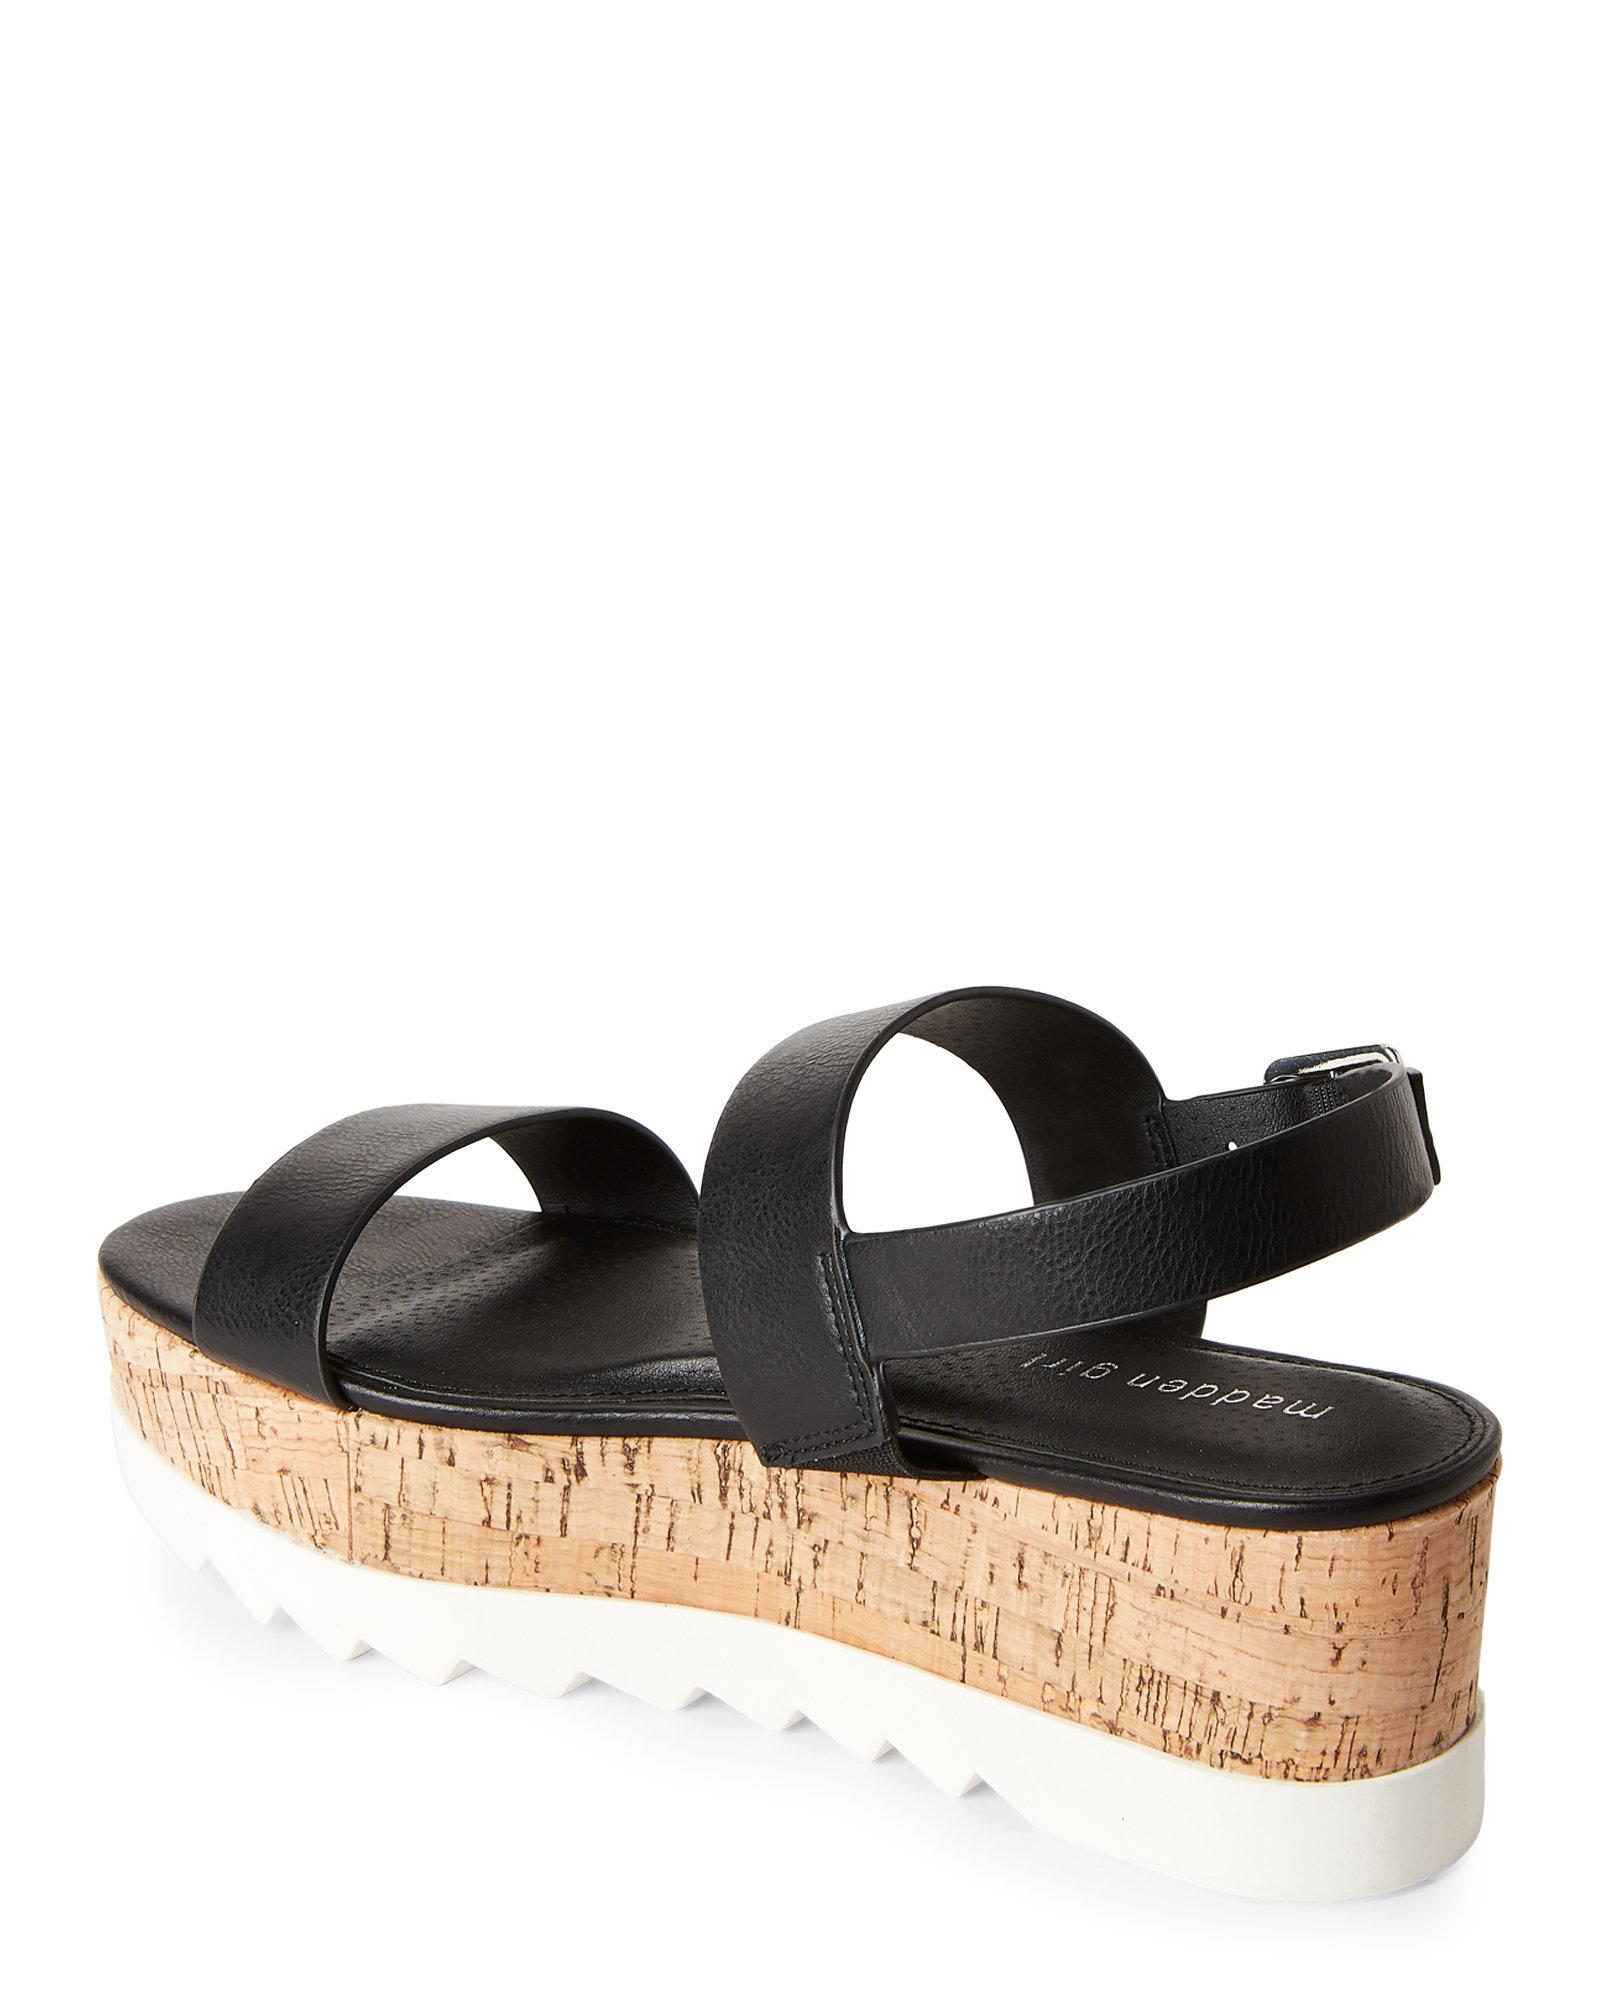 e0eeb949f95 Lyst - Madden Girl Black Suga Flatform Slingback Sandals in Black